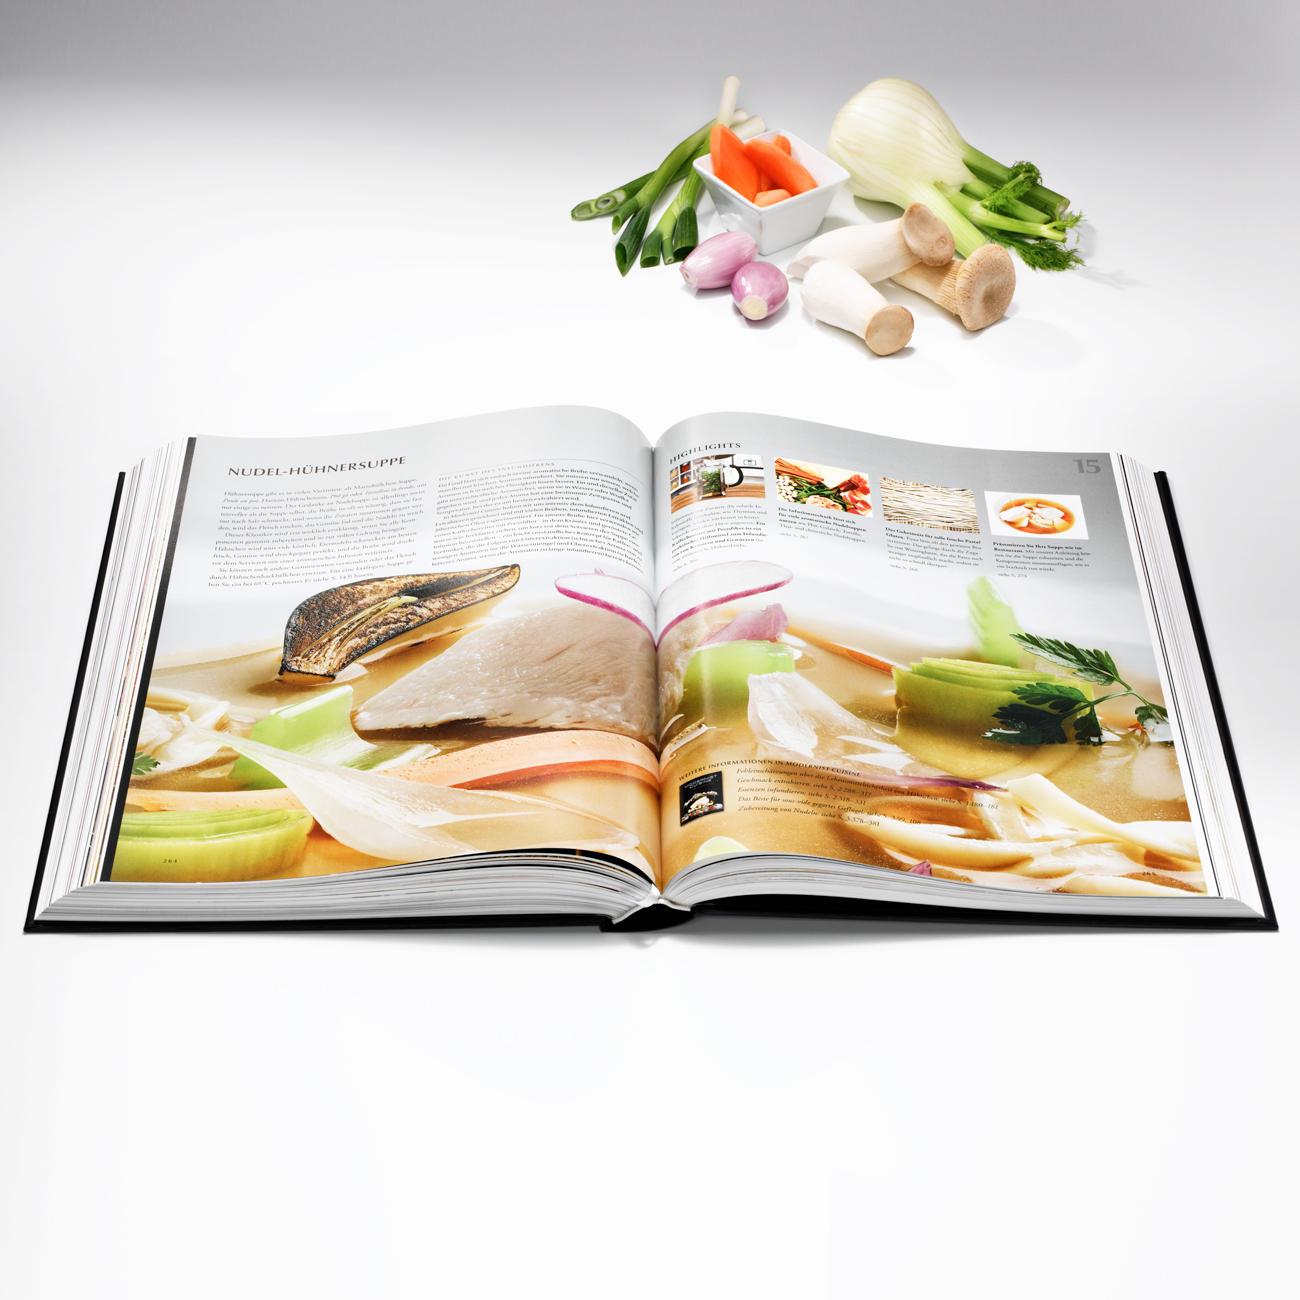 Kochbuch modernist cuisine at home online kaufen for Taschen cuisine